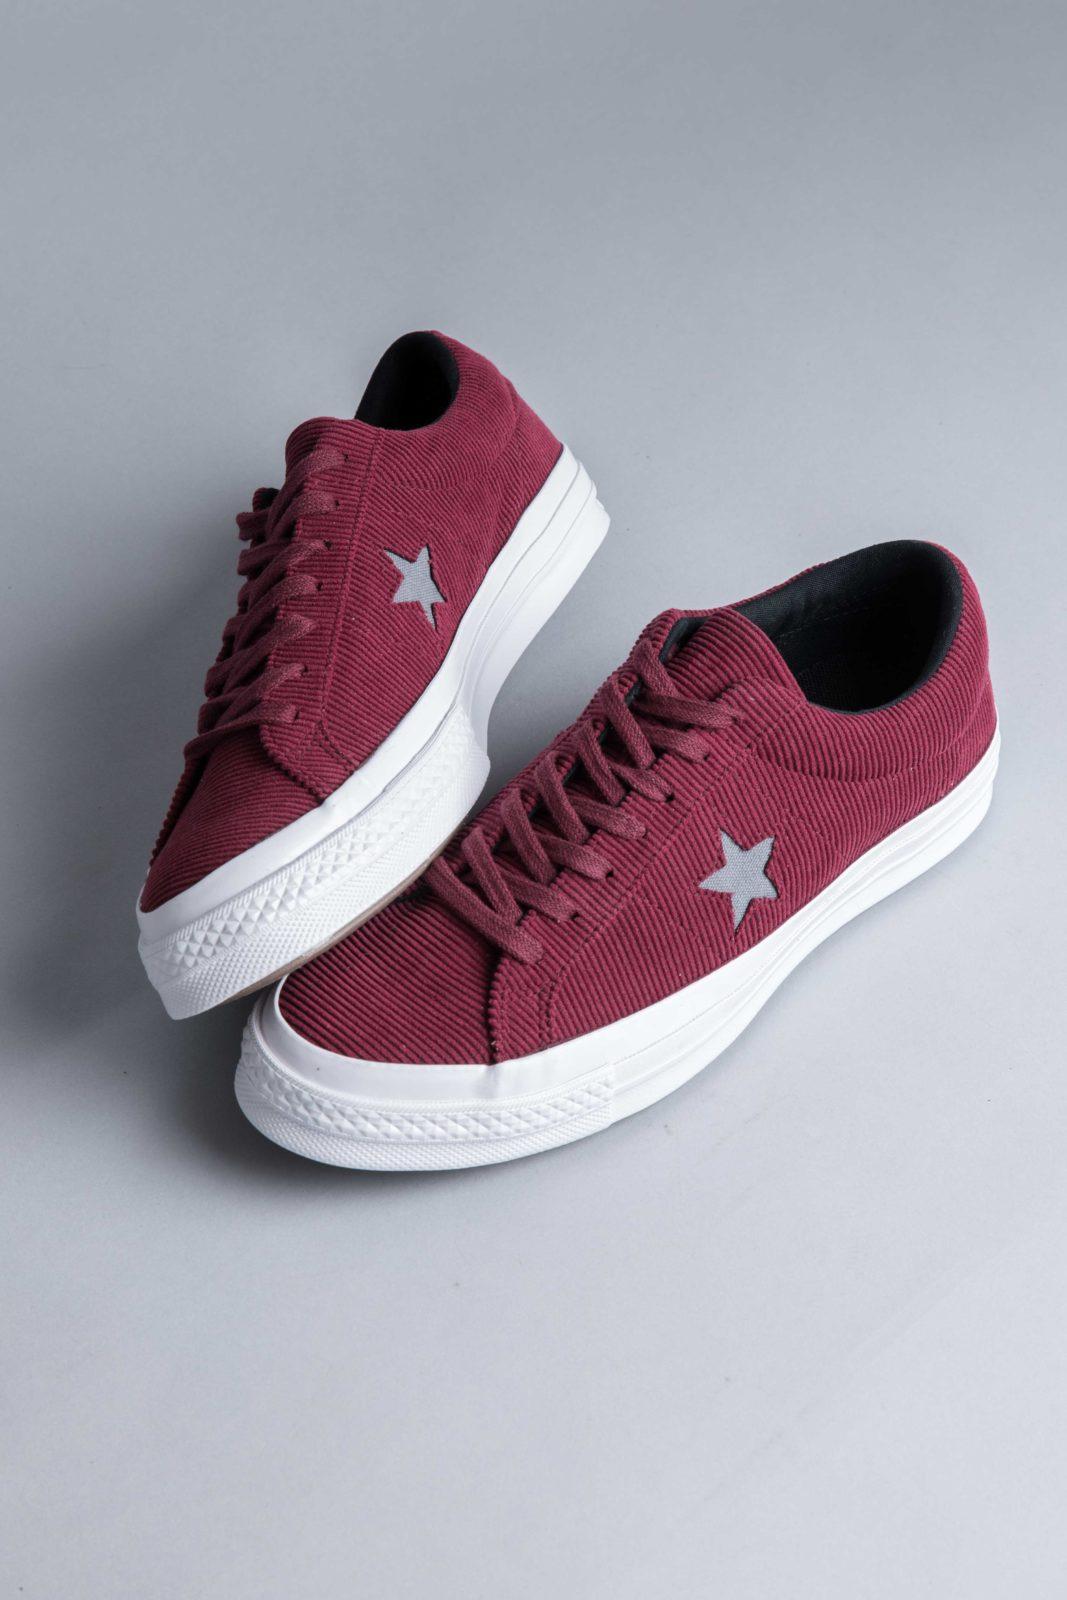 Converse One Star OX Corduroy Dark Burgundy Mason • Centreville Store b862d7f3a